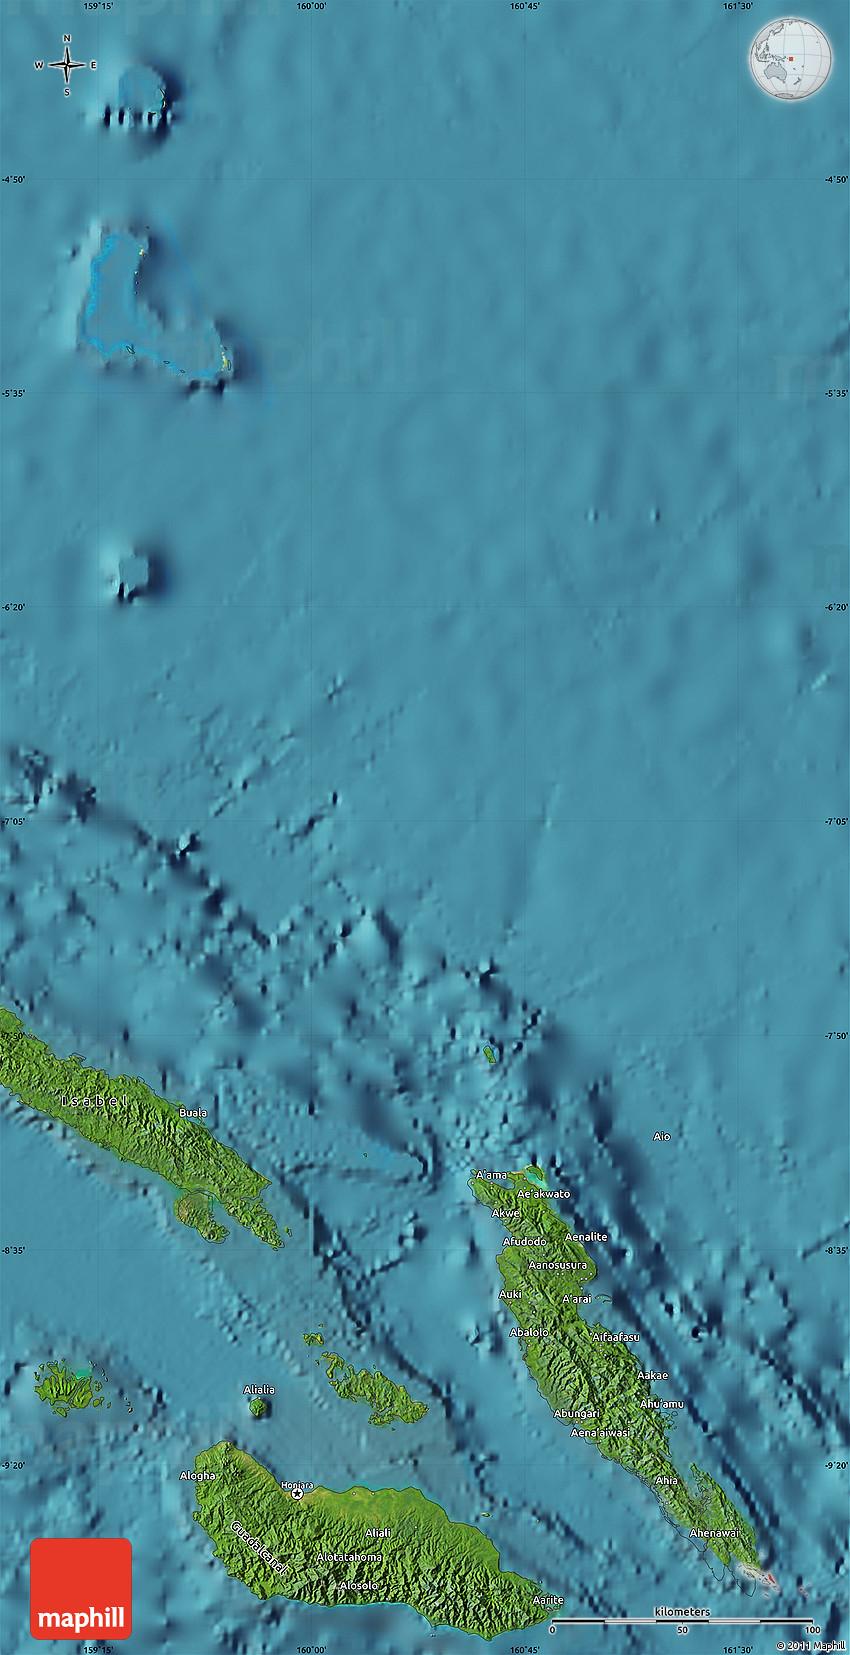 satellite-map-of-malaita Satellite Map Of Solomon Islands on satellite map of the gambia, satellite map of qatar, satellite map of trinidad and tobago, satellite map of saipan, satellite map of anguilla, satellite map of kosovo, satellite map of iraq, satellite map of somalia, satellite map of brunei darussalam, satellite map of vatican city, satellite map of montserrat, satellite map of czech republic, satellite map of united states of america, satellite map of angola, satellite map of haiti, satellite map of iceland, satellite map of tunisia, satellite map of mali, satellite map of mauritania, satellite map of south korea,